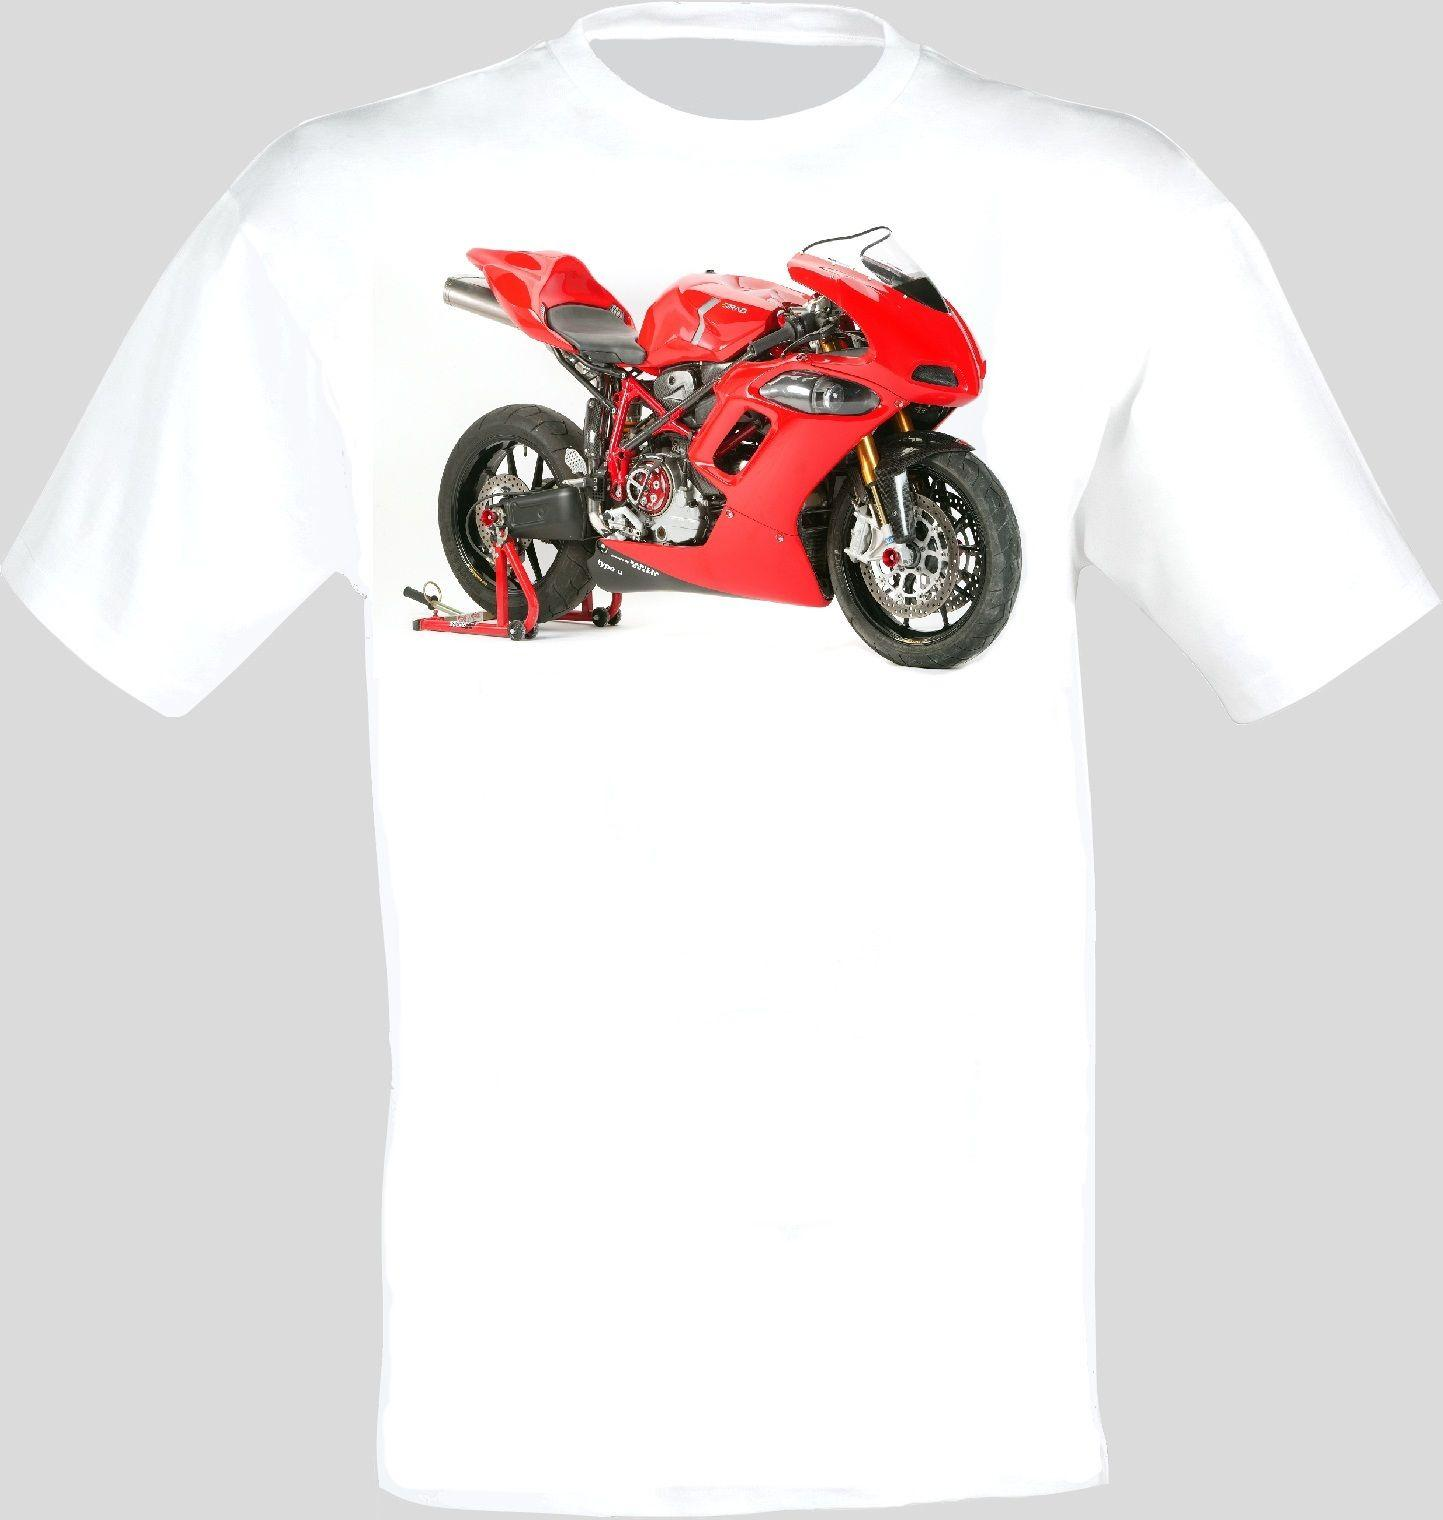 bab77f1aa36f8c Großhandel Ducati Rad 01 Motorrad Bikes Super Sport Fahrrad Männer T Shirt  Von Beidhgate07